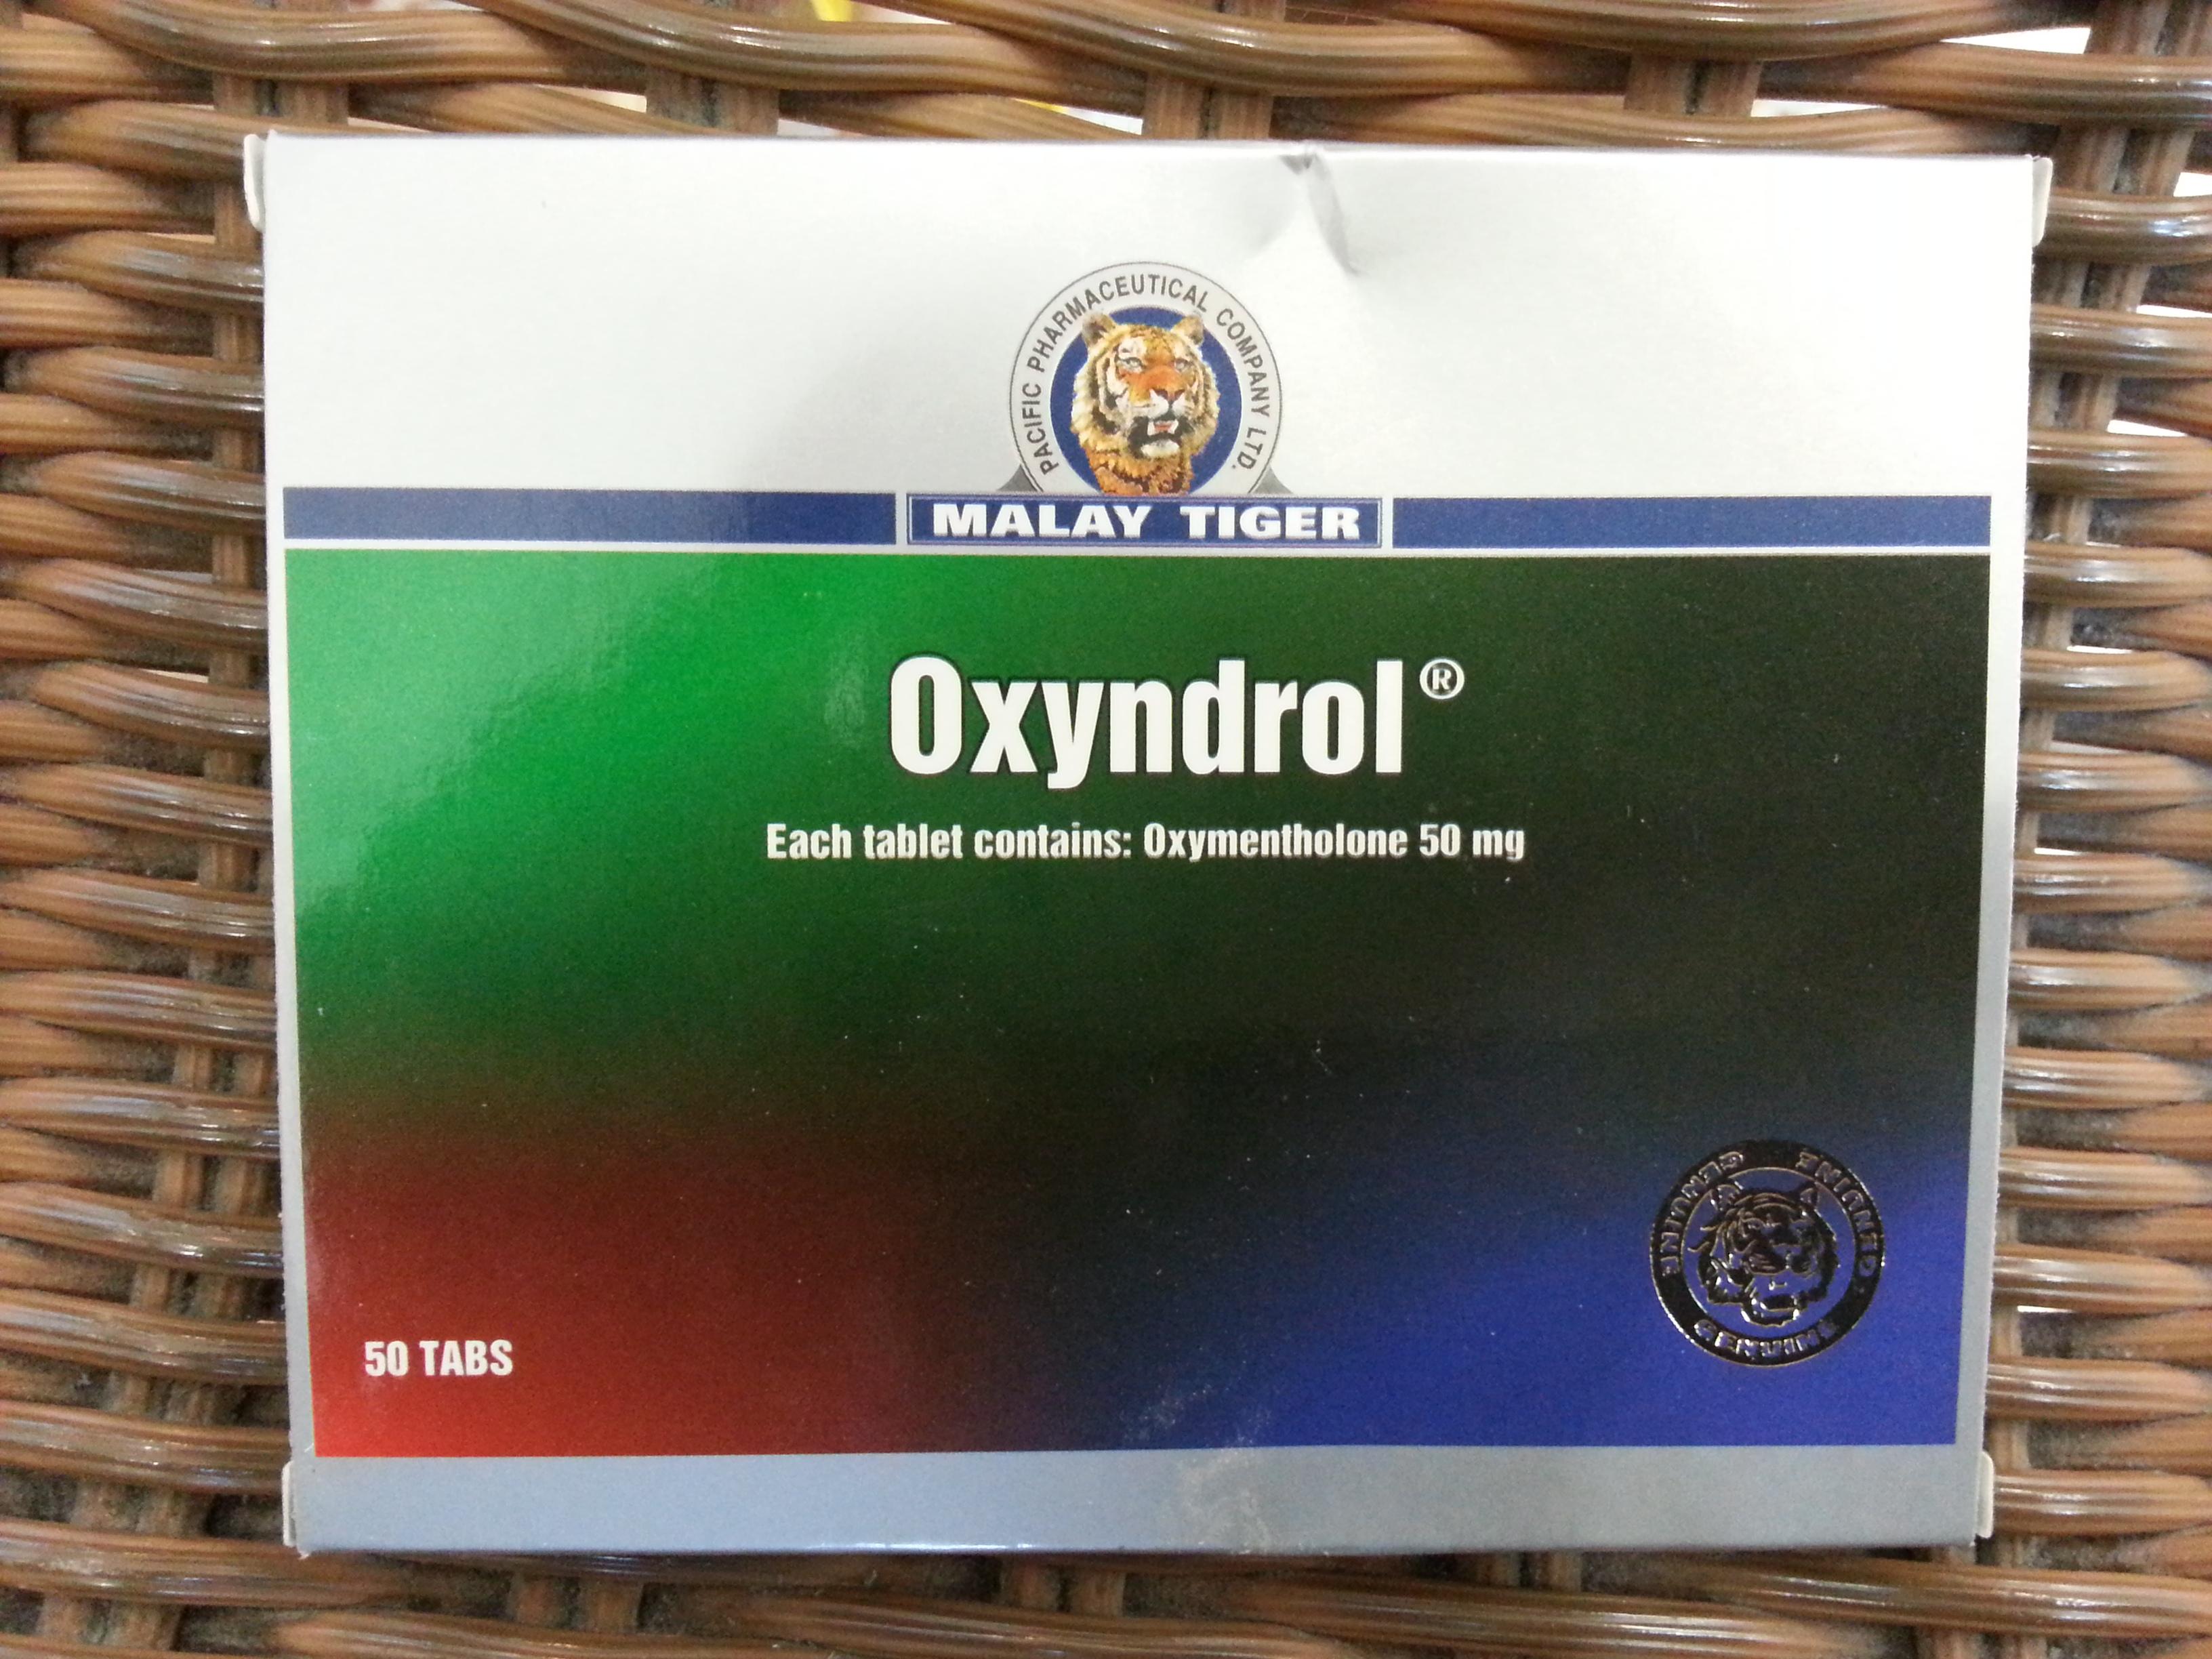 Malay Tiger Oxyndrol Lab Test Results - Anabolic Lab